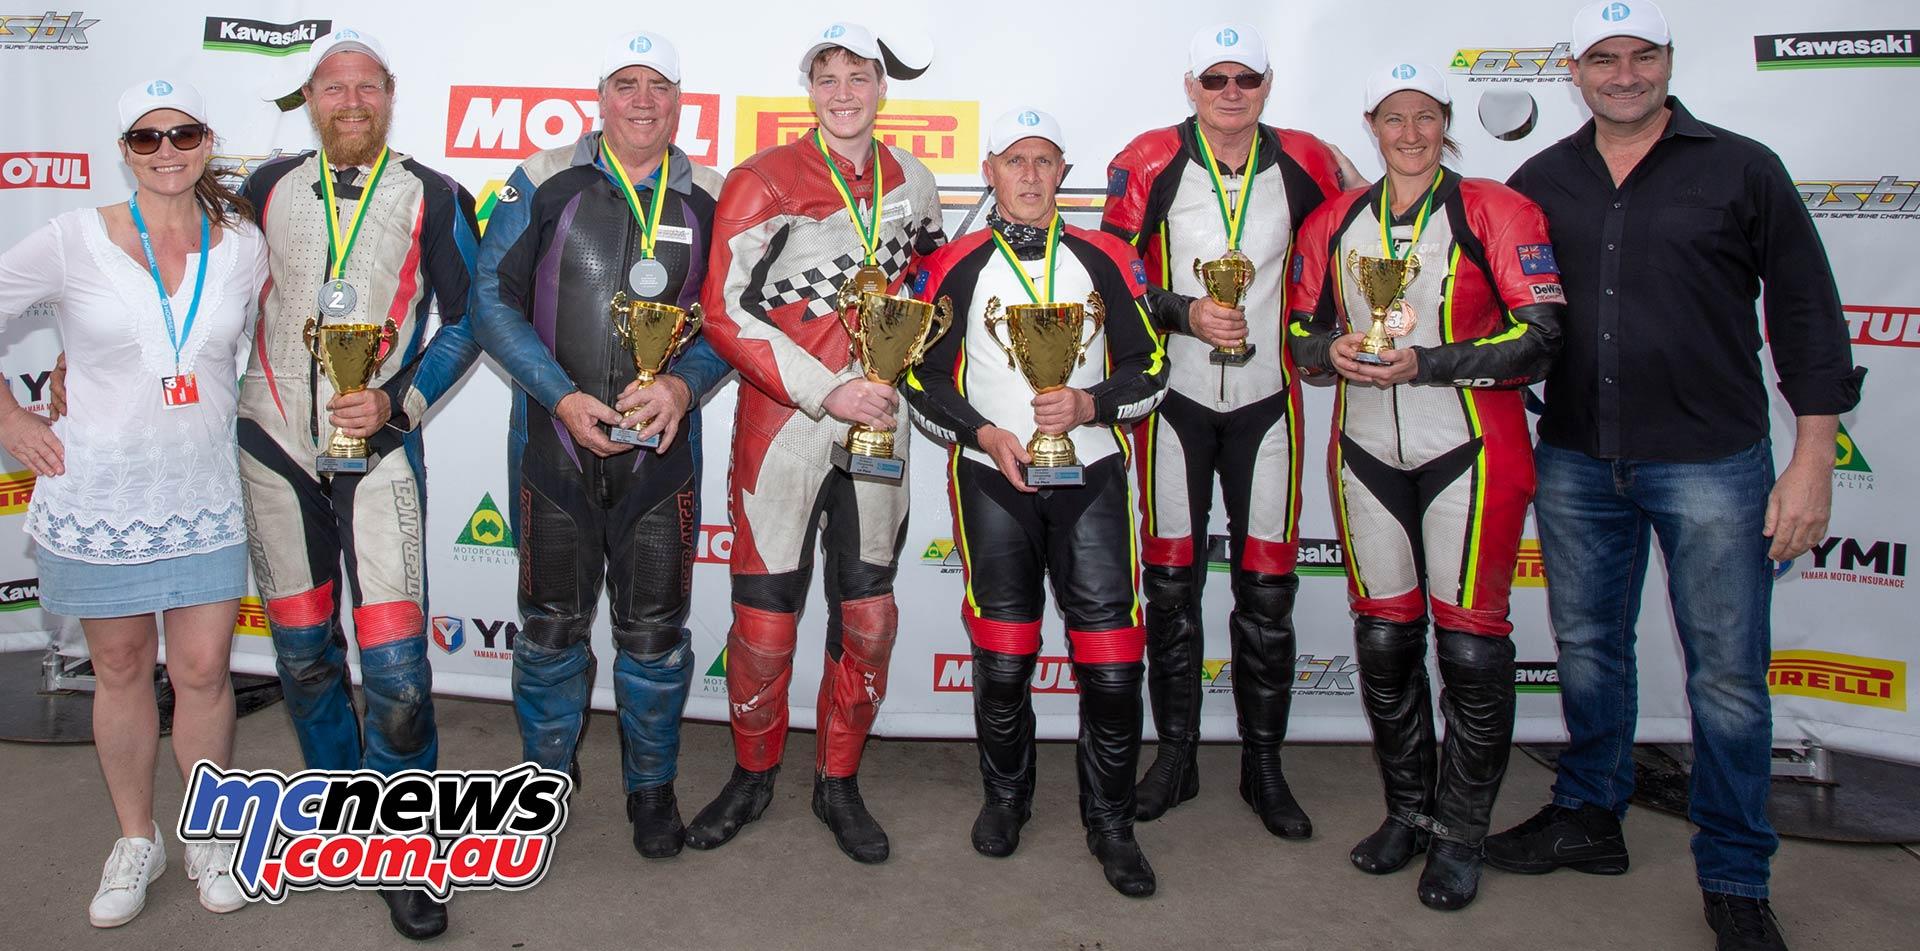 ASBK TBG Round Phillip Island F Sidecars Champions TBG Sunday